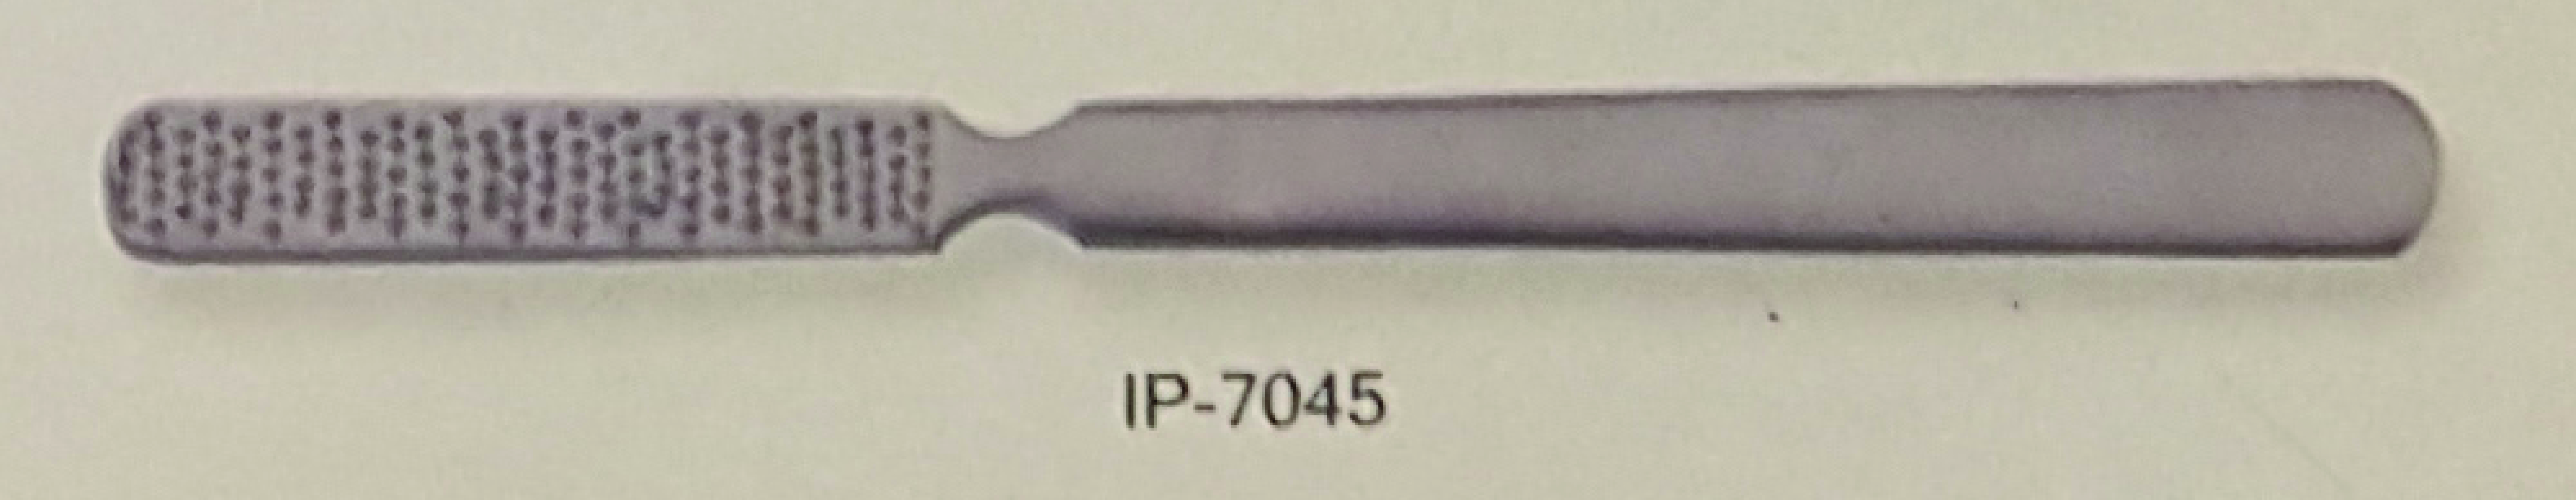 IP-7045